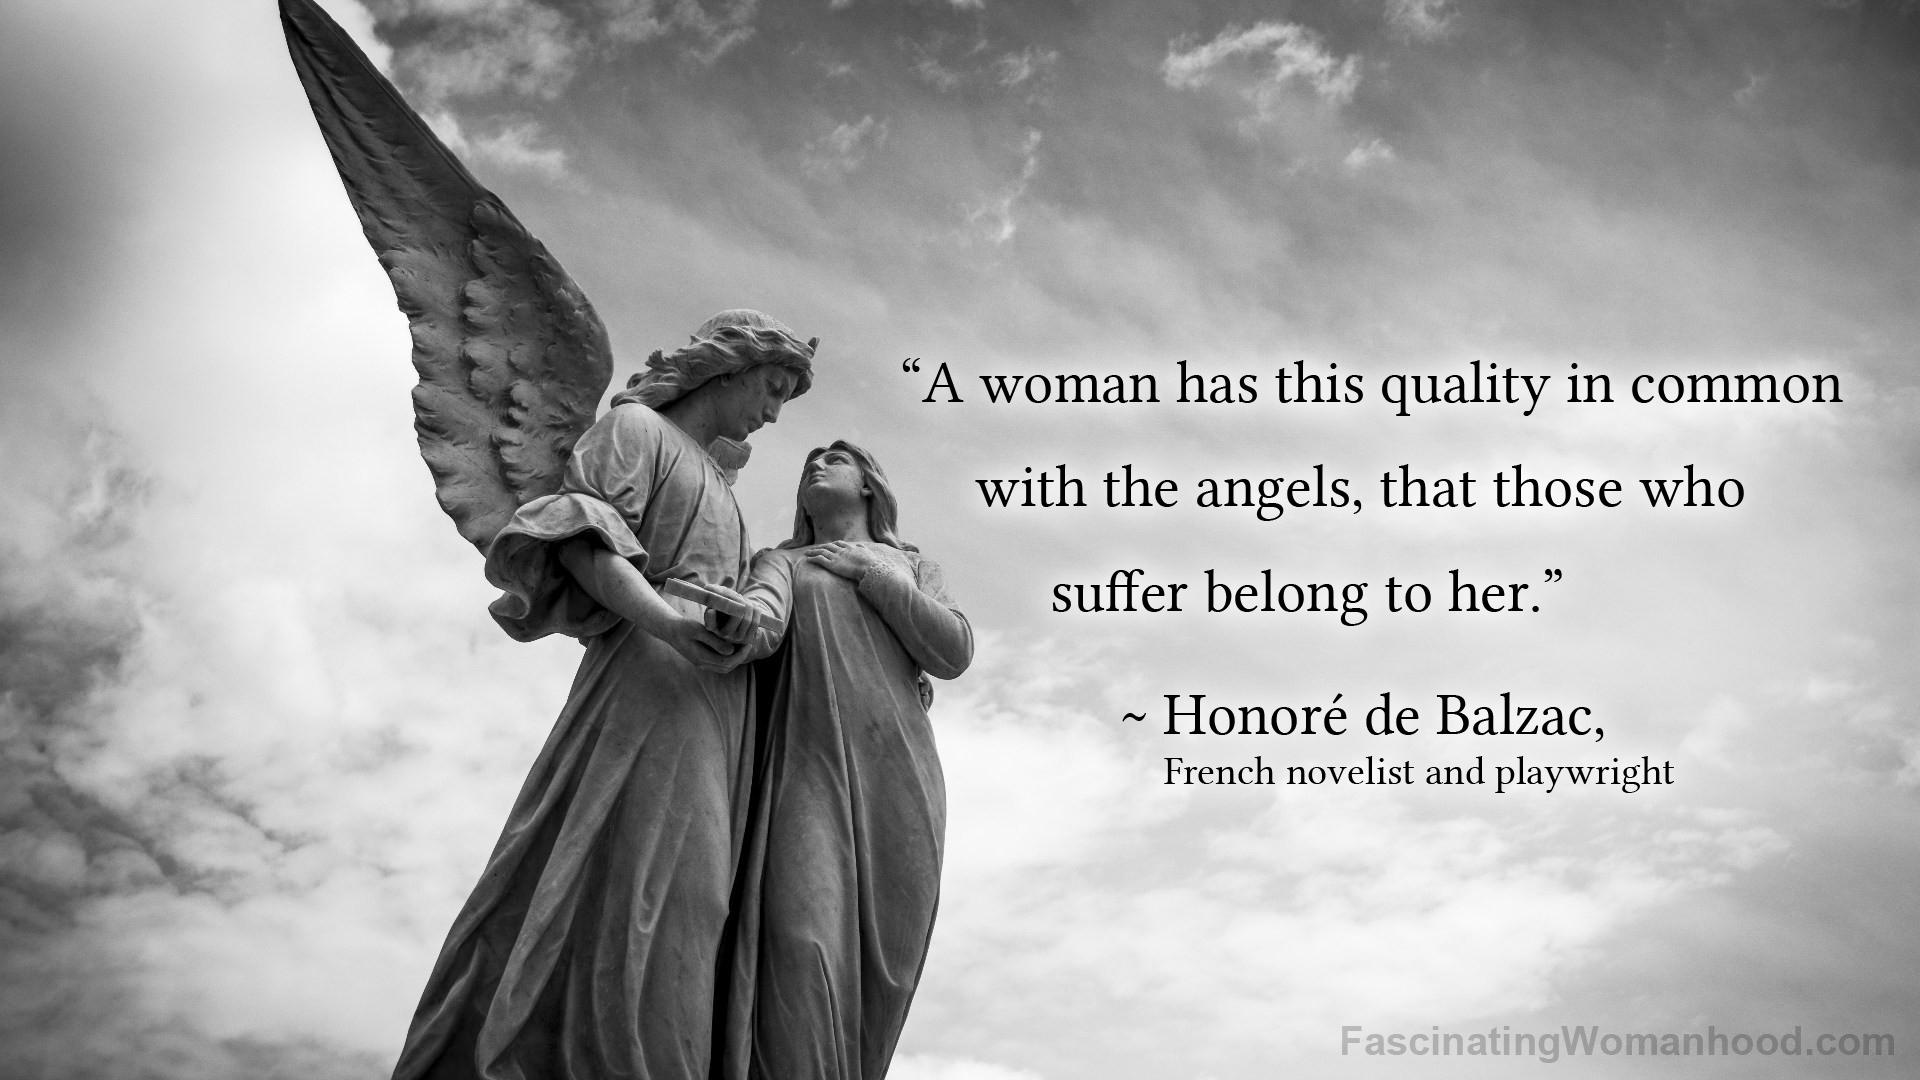 A Quote Honore de Balzac.jpg